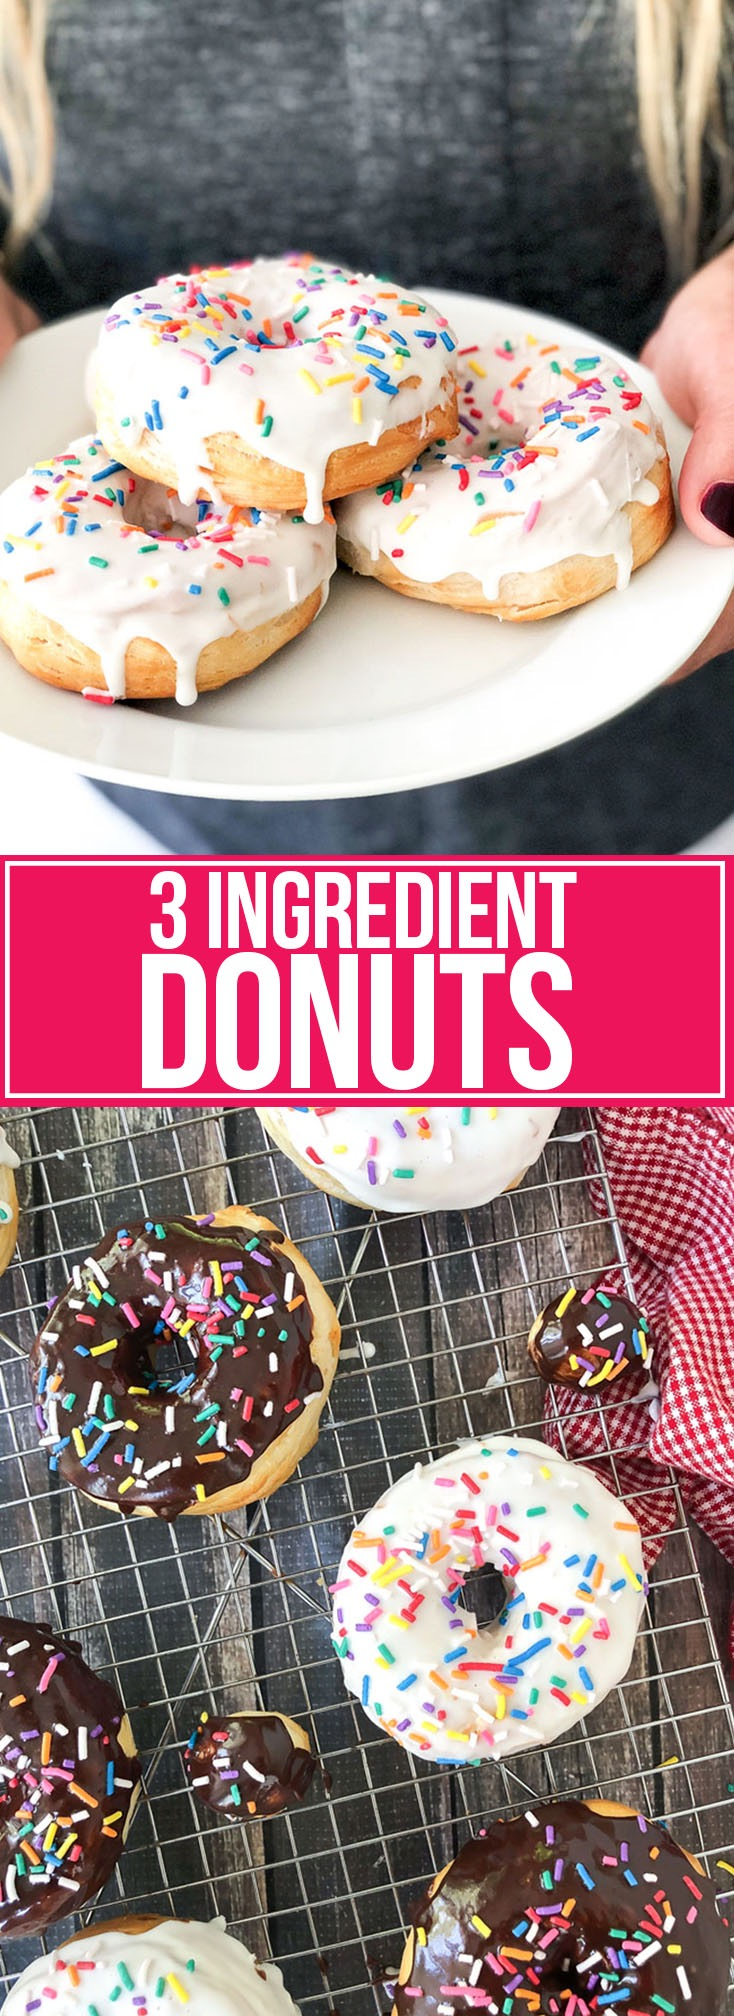 3 ingredient donuts